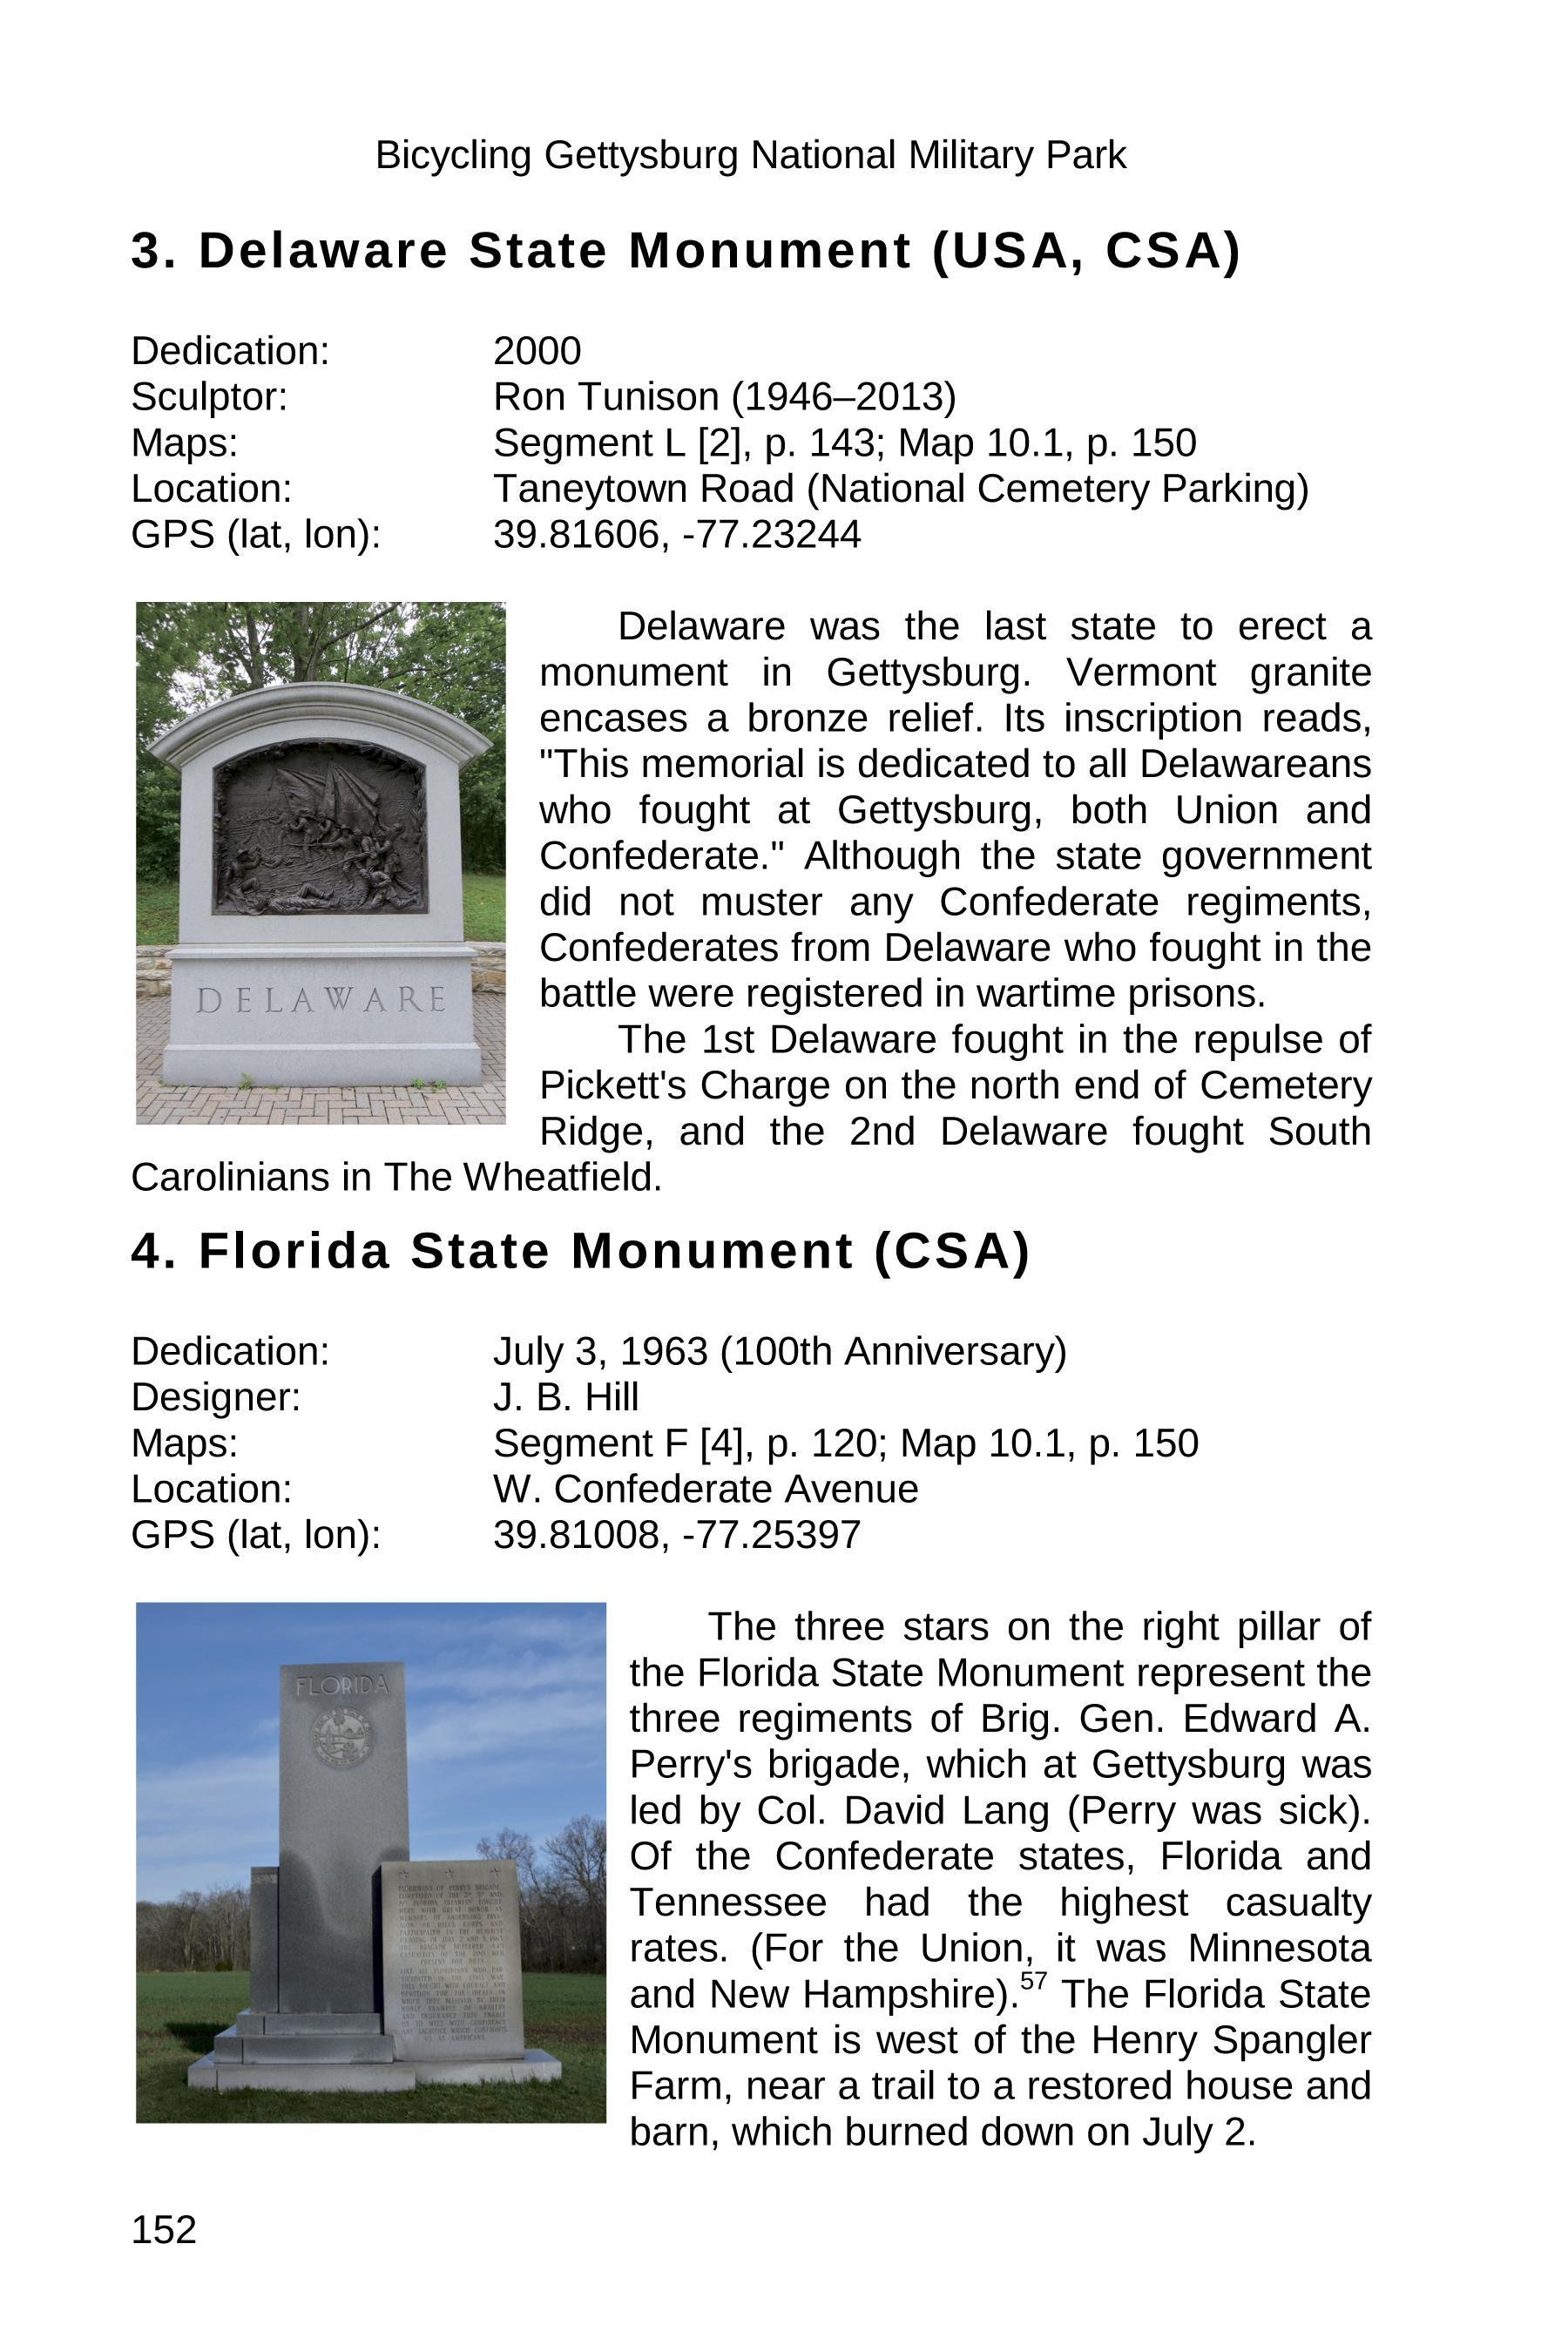 gettysburg state monuments sample 152